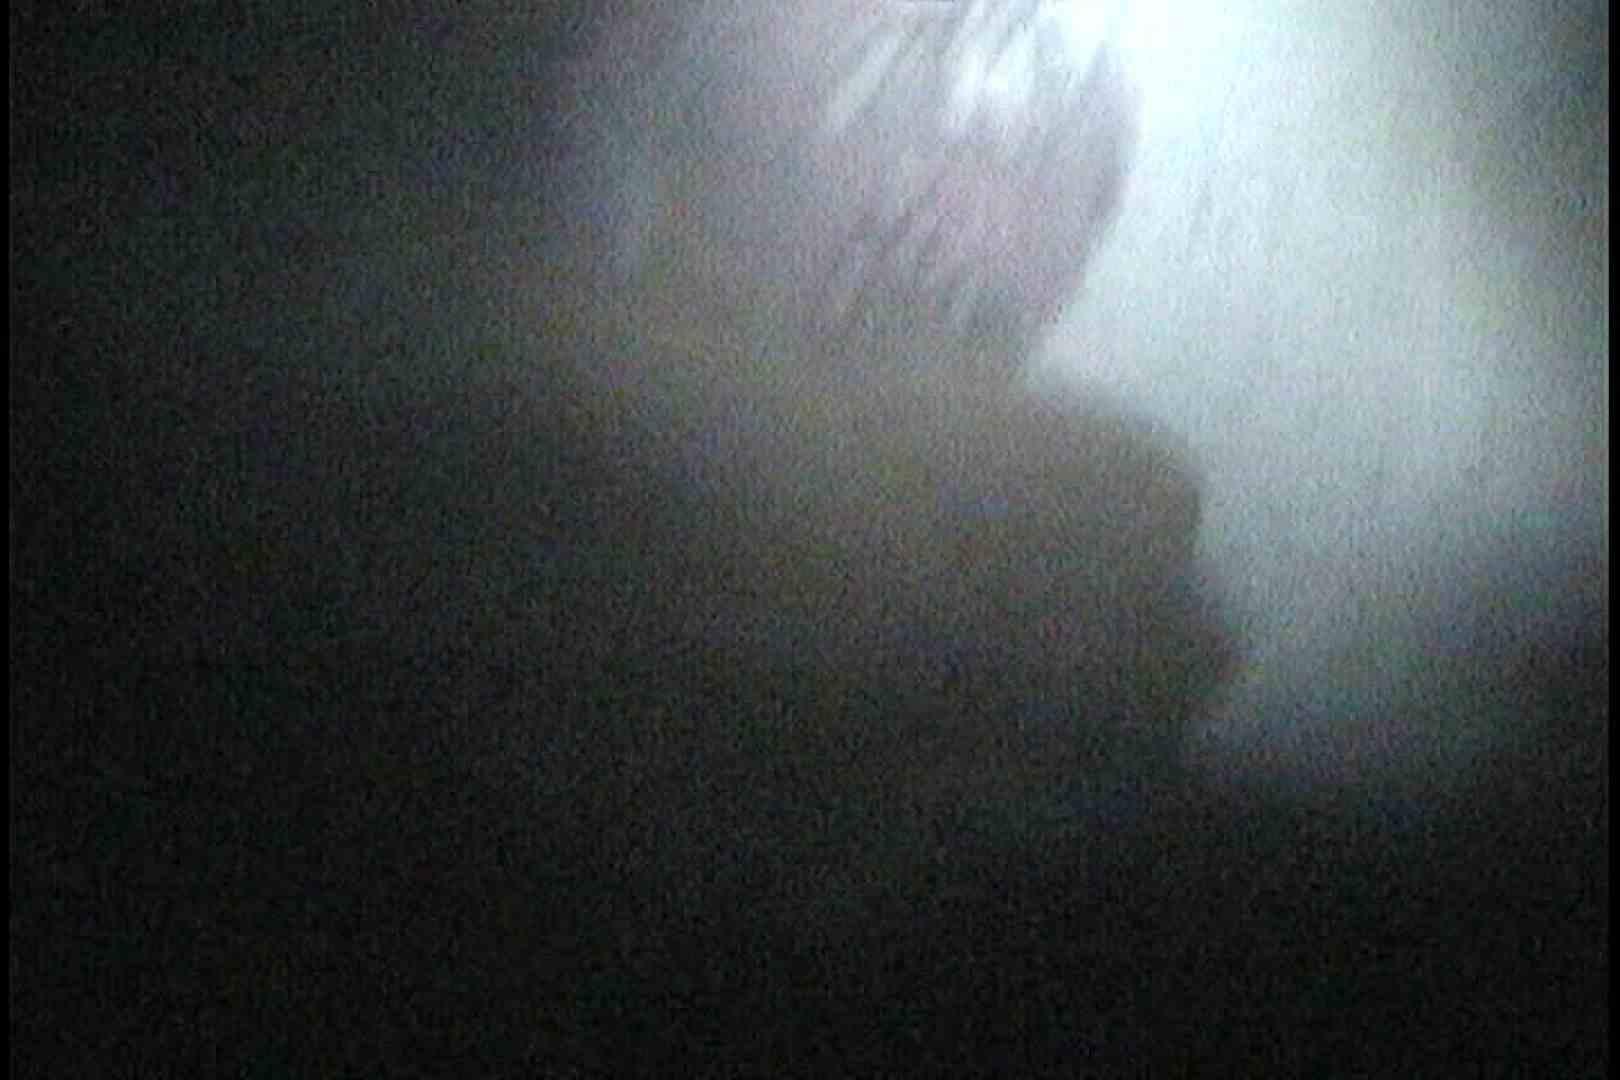 No.18 小さい割にはたれ気味の乳房 垂れ乳 オマンコ無修正動画無料 81枚 7